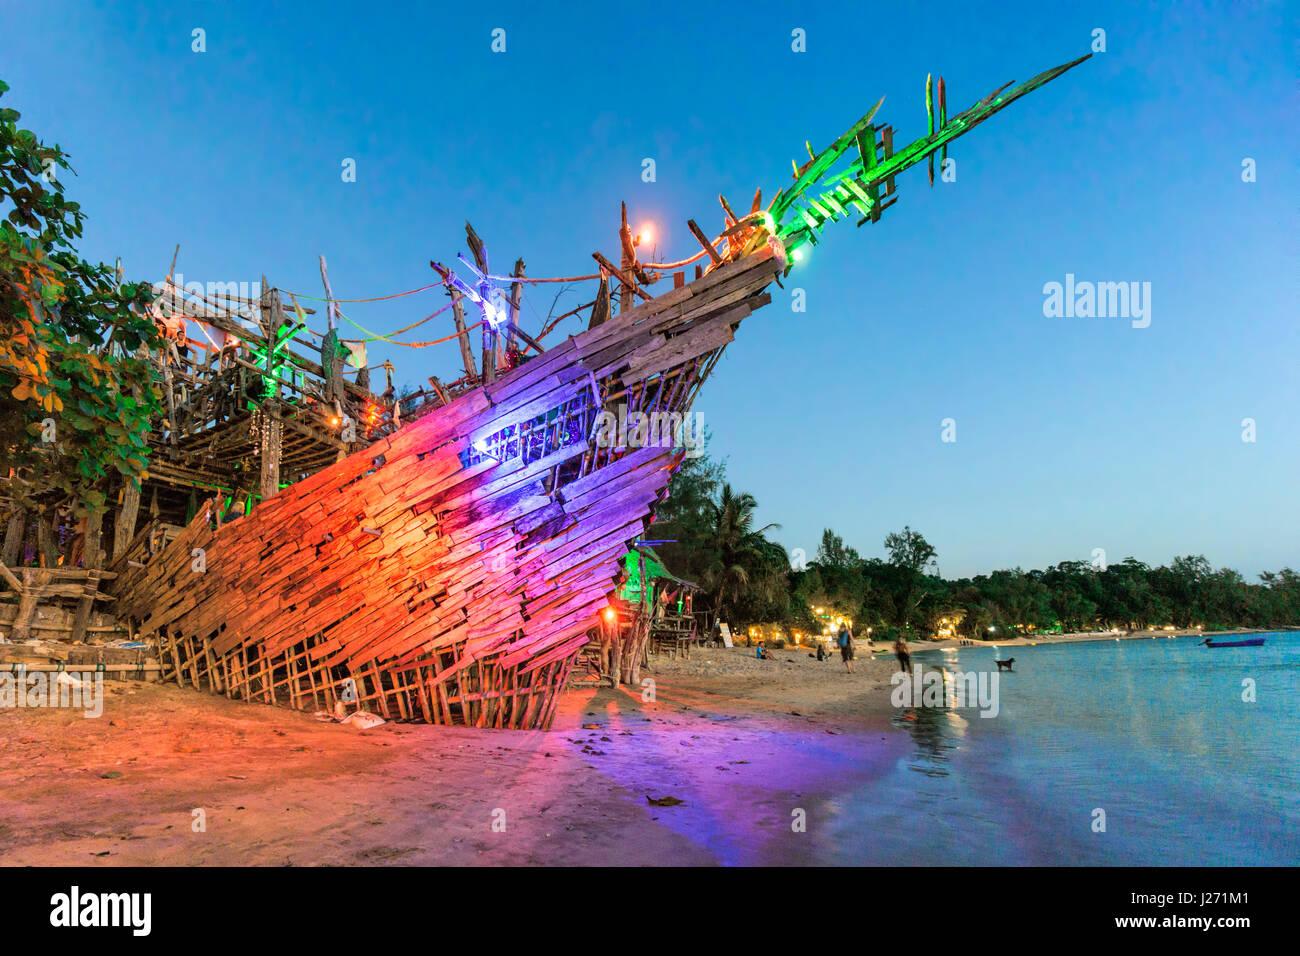 Hippie Bar, Tree House Bar, Buffallo Bay, Aow Kao Kwai,  Koh Phayam, Ranong, Thailand - Stock Image